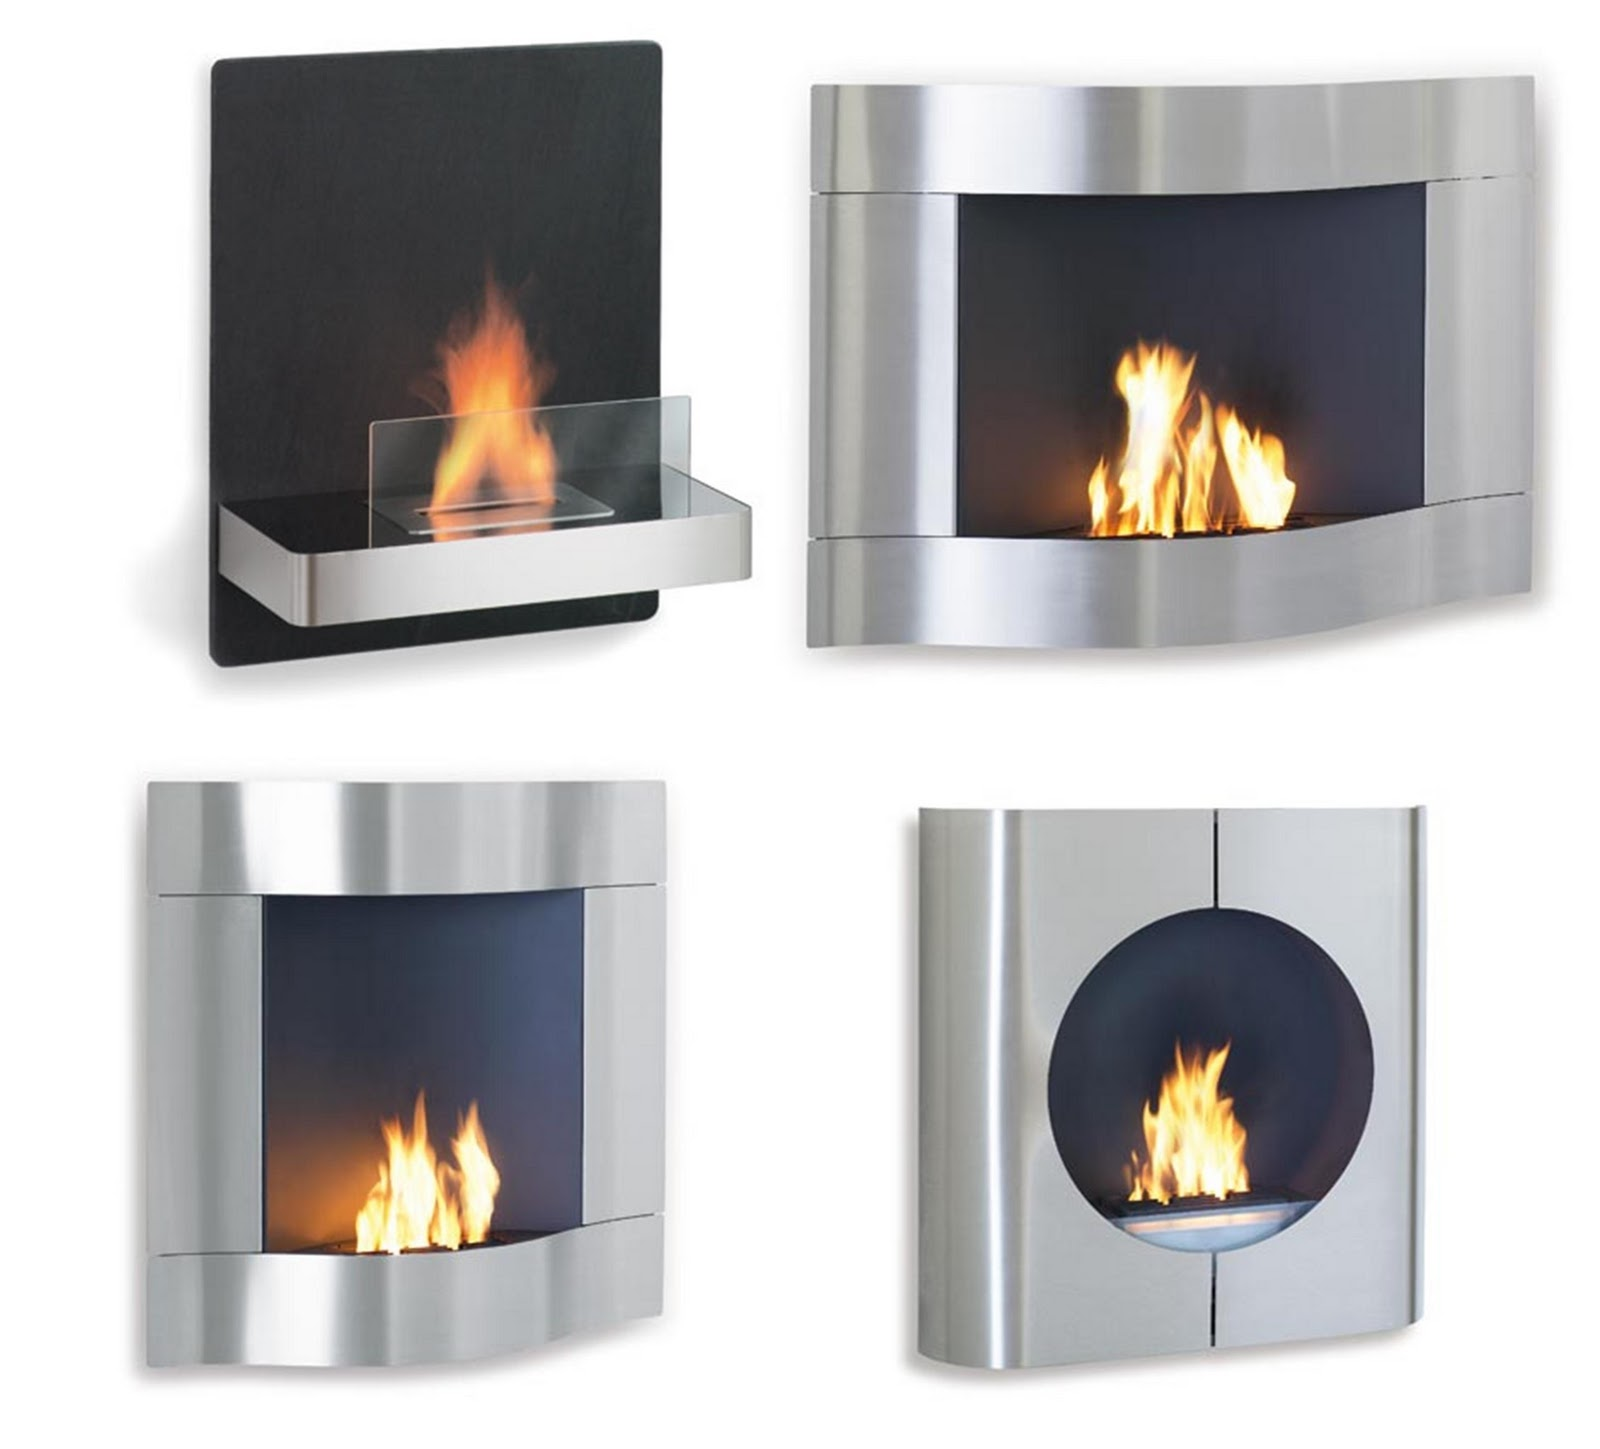 Ventless Gas Wall Heater | Autos Post